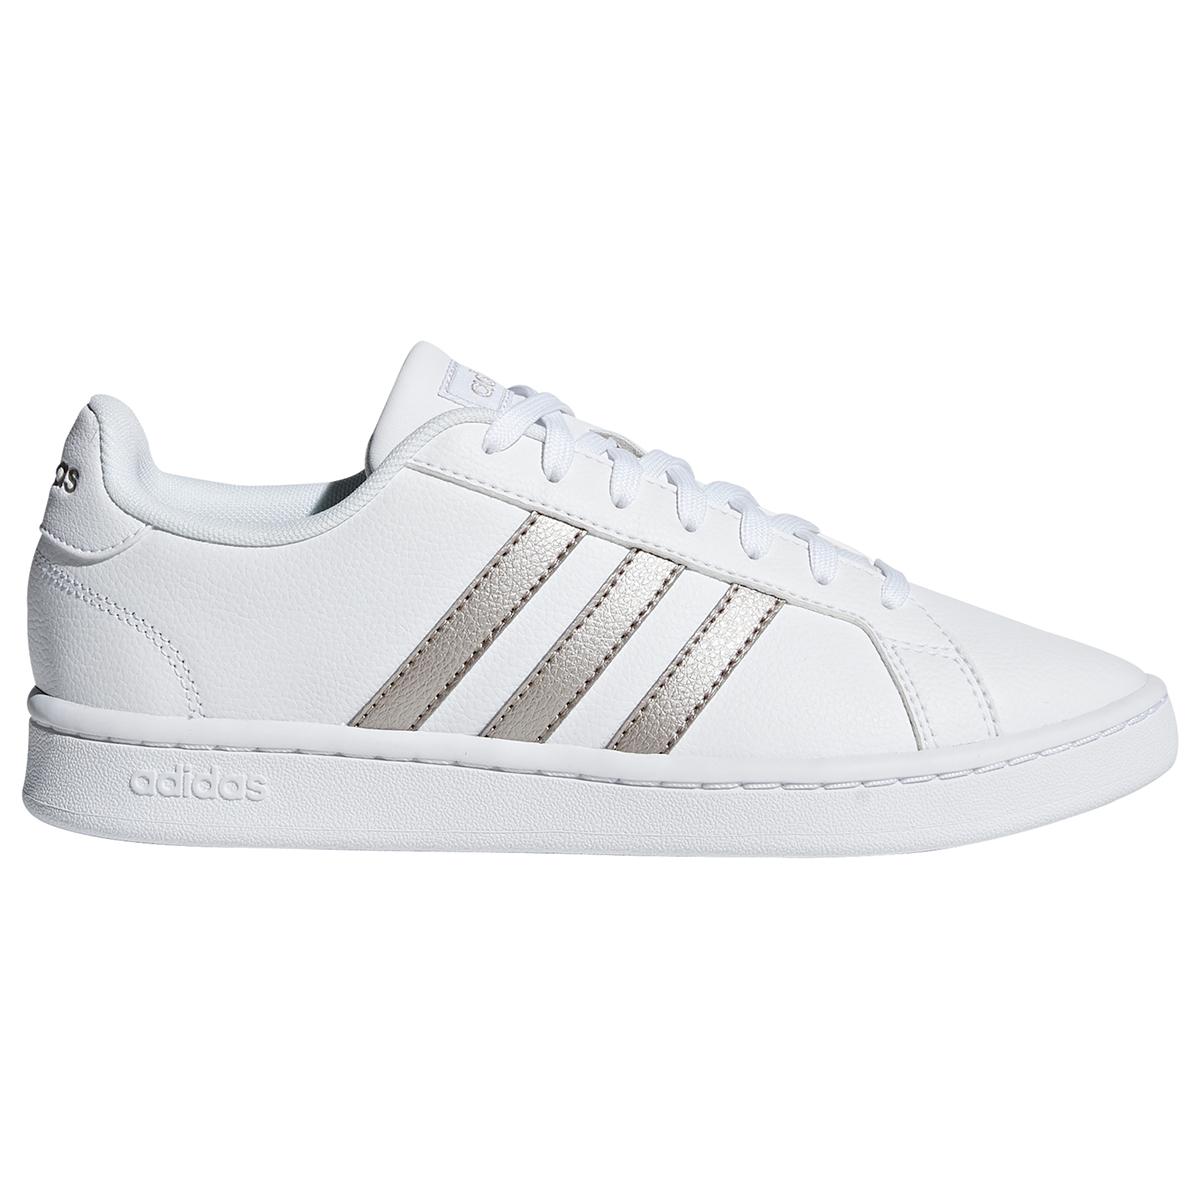 Adidas Women's Grand Court Sneakers | eBay